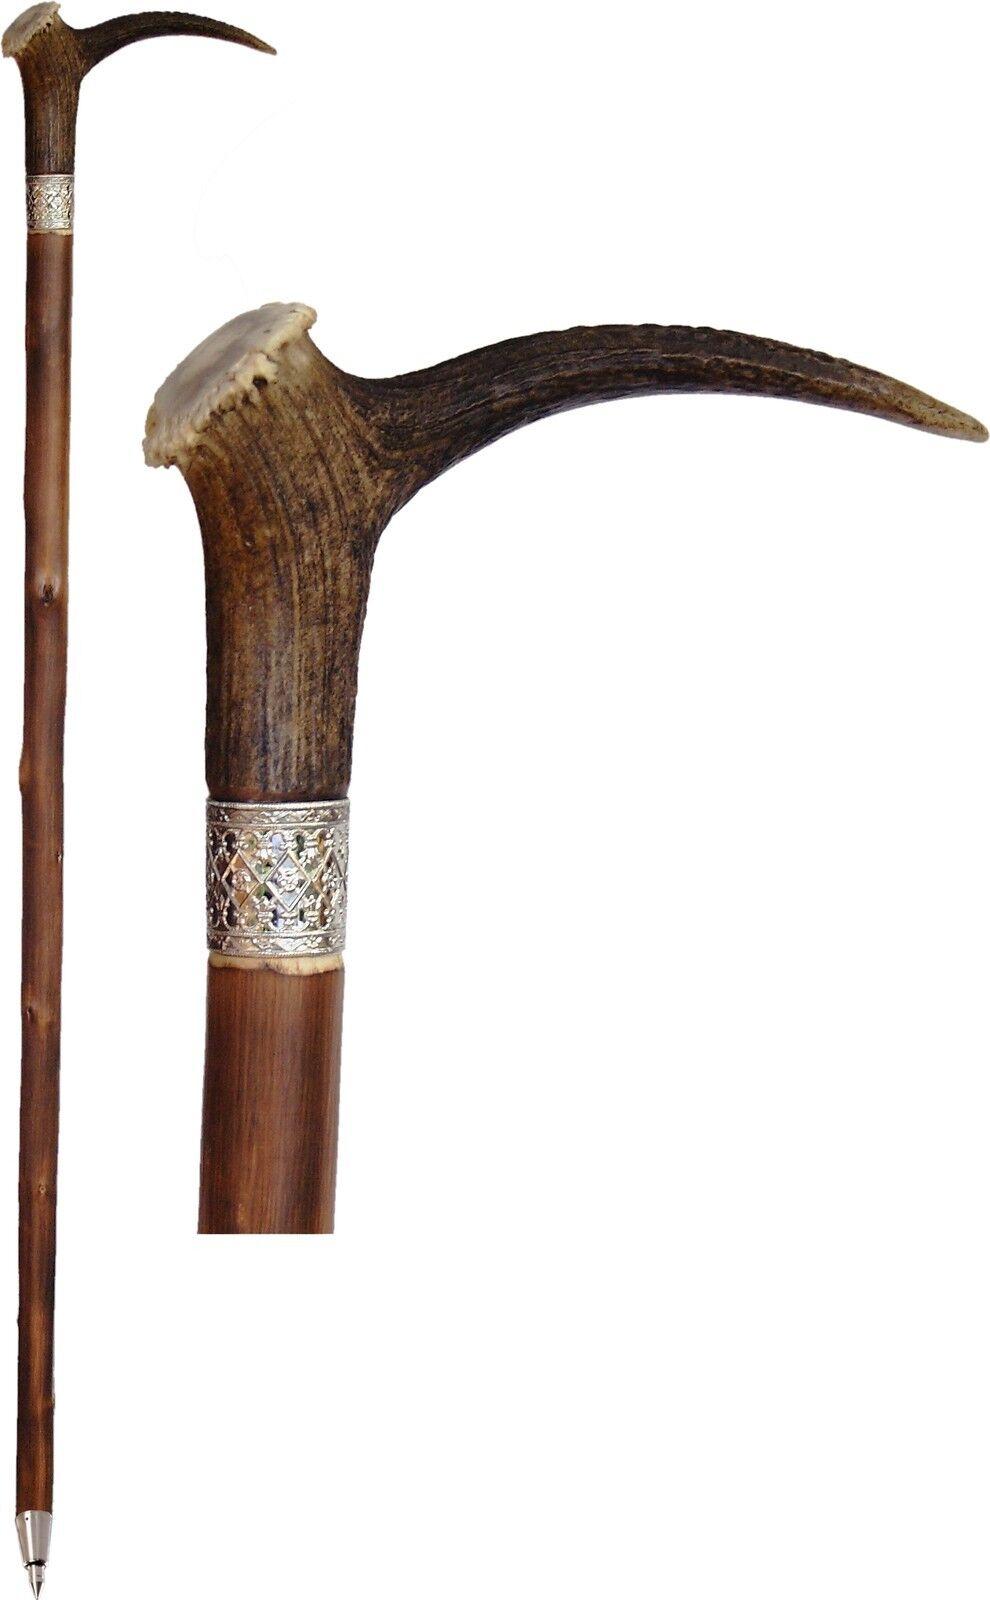 Telescópicos con hirschhorn-augsprosse-mango bastón edelkastanie senderismo Outdoor